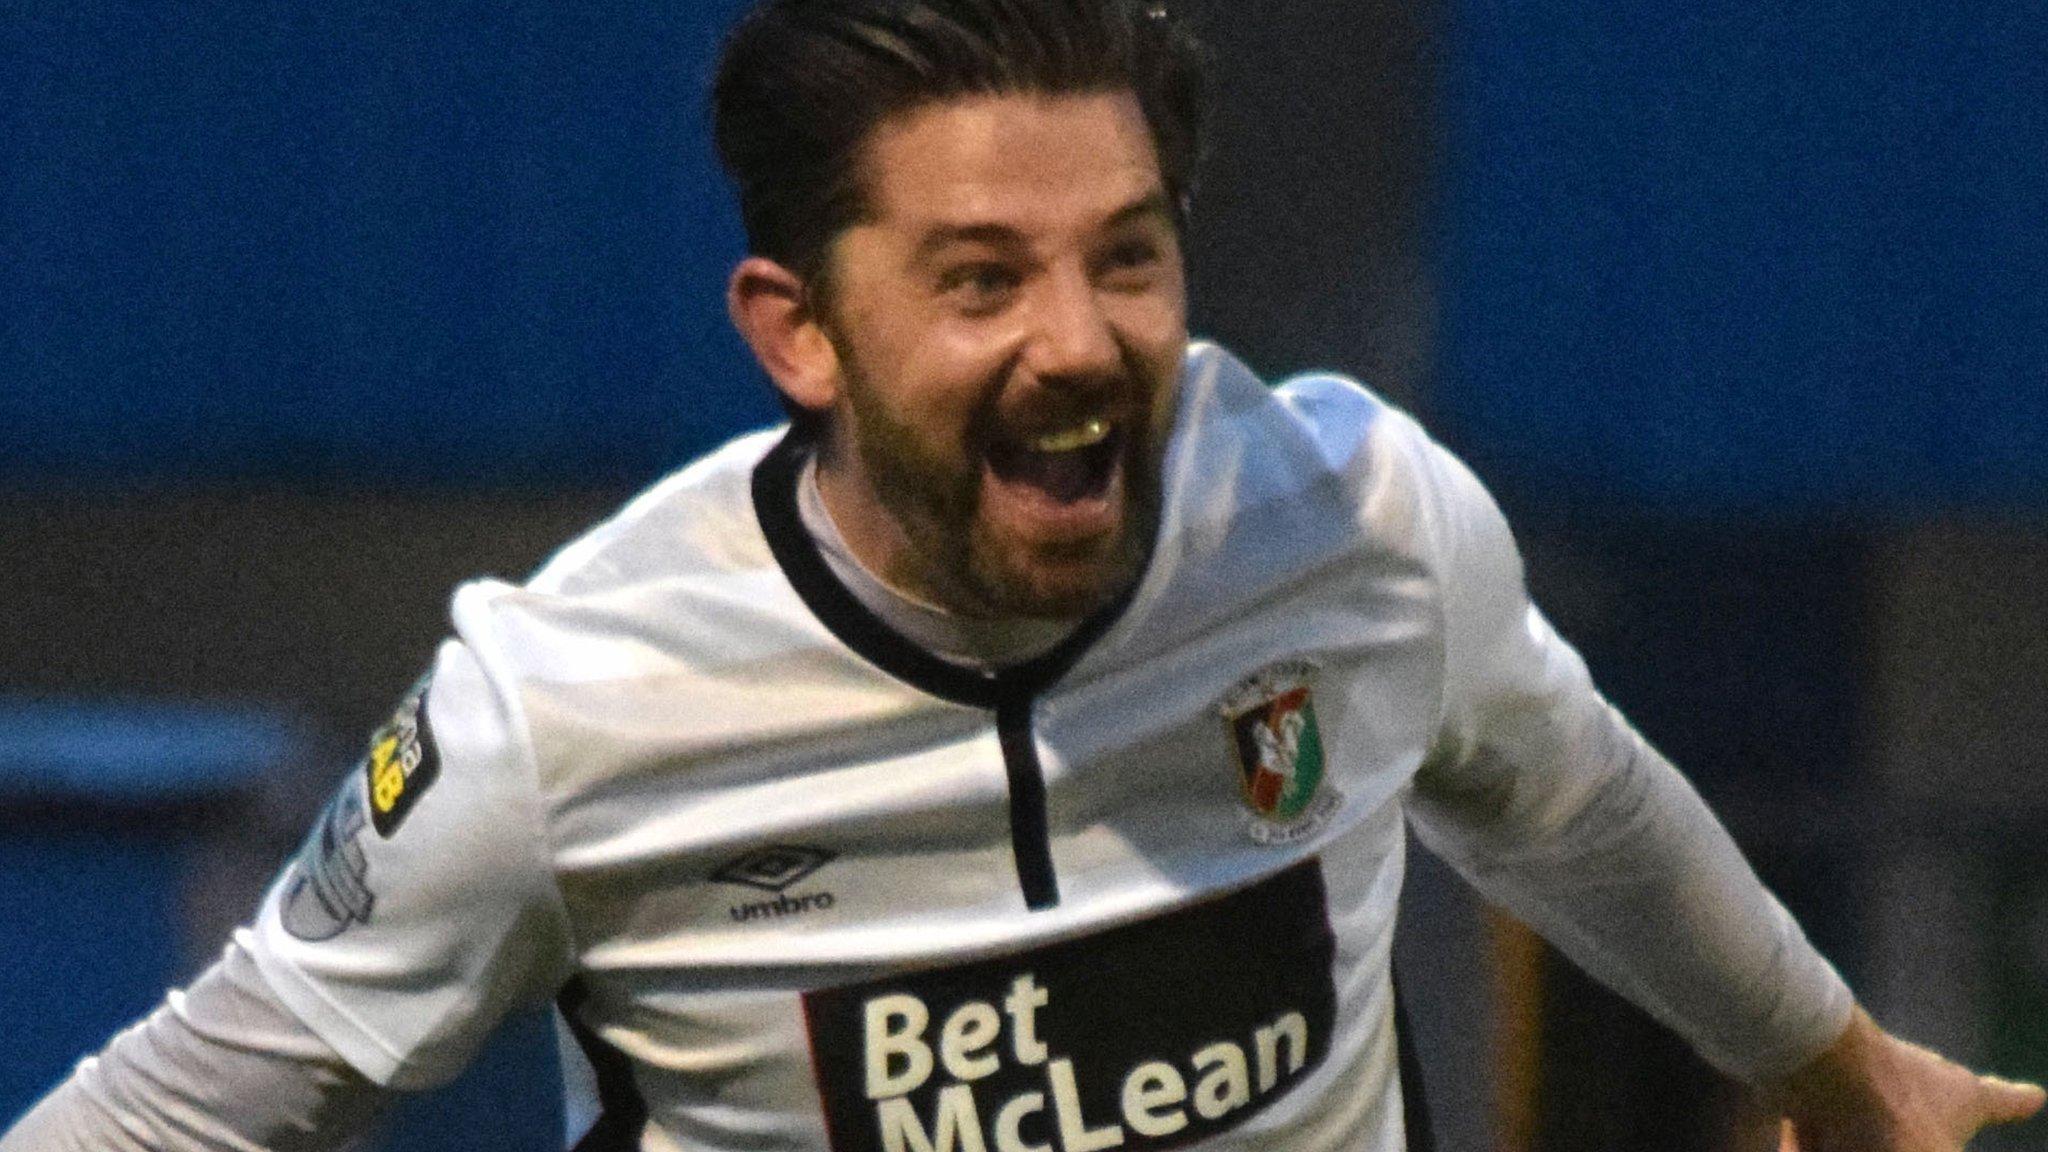 Irish Premiership: A Curtis Allen double fires Glentoran to away win over relegation battlers Newry